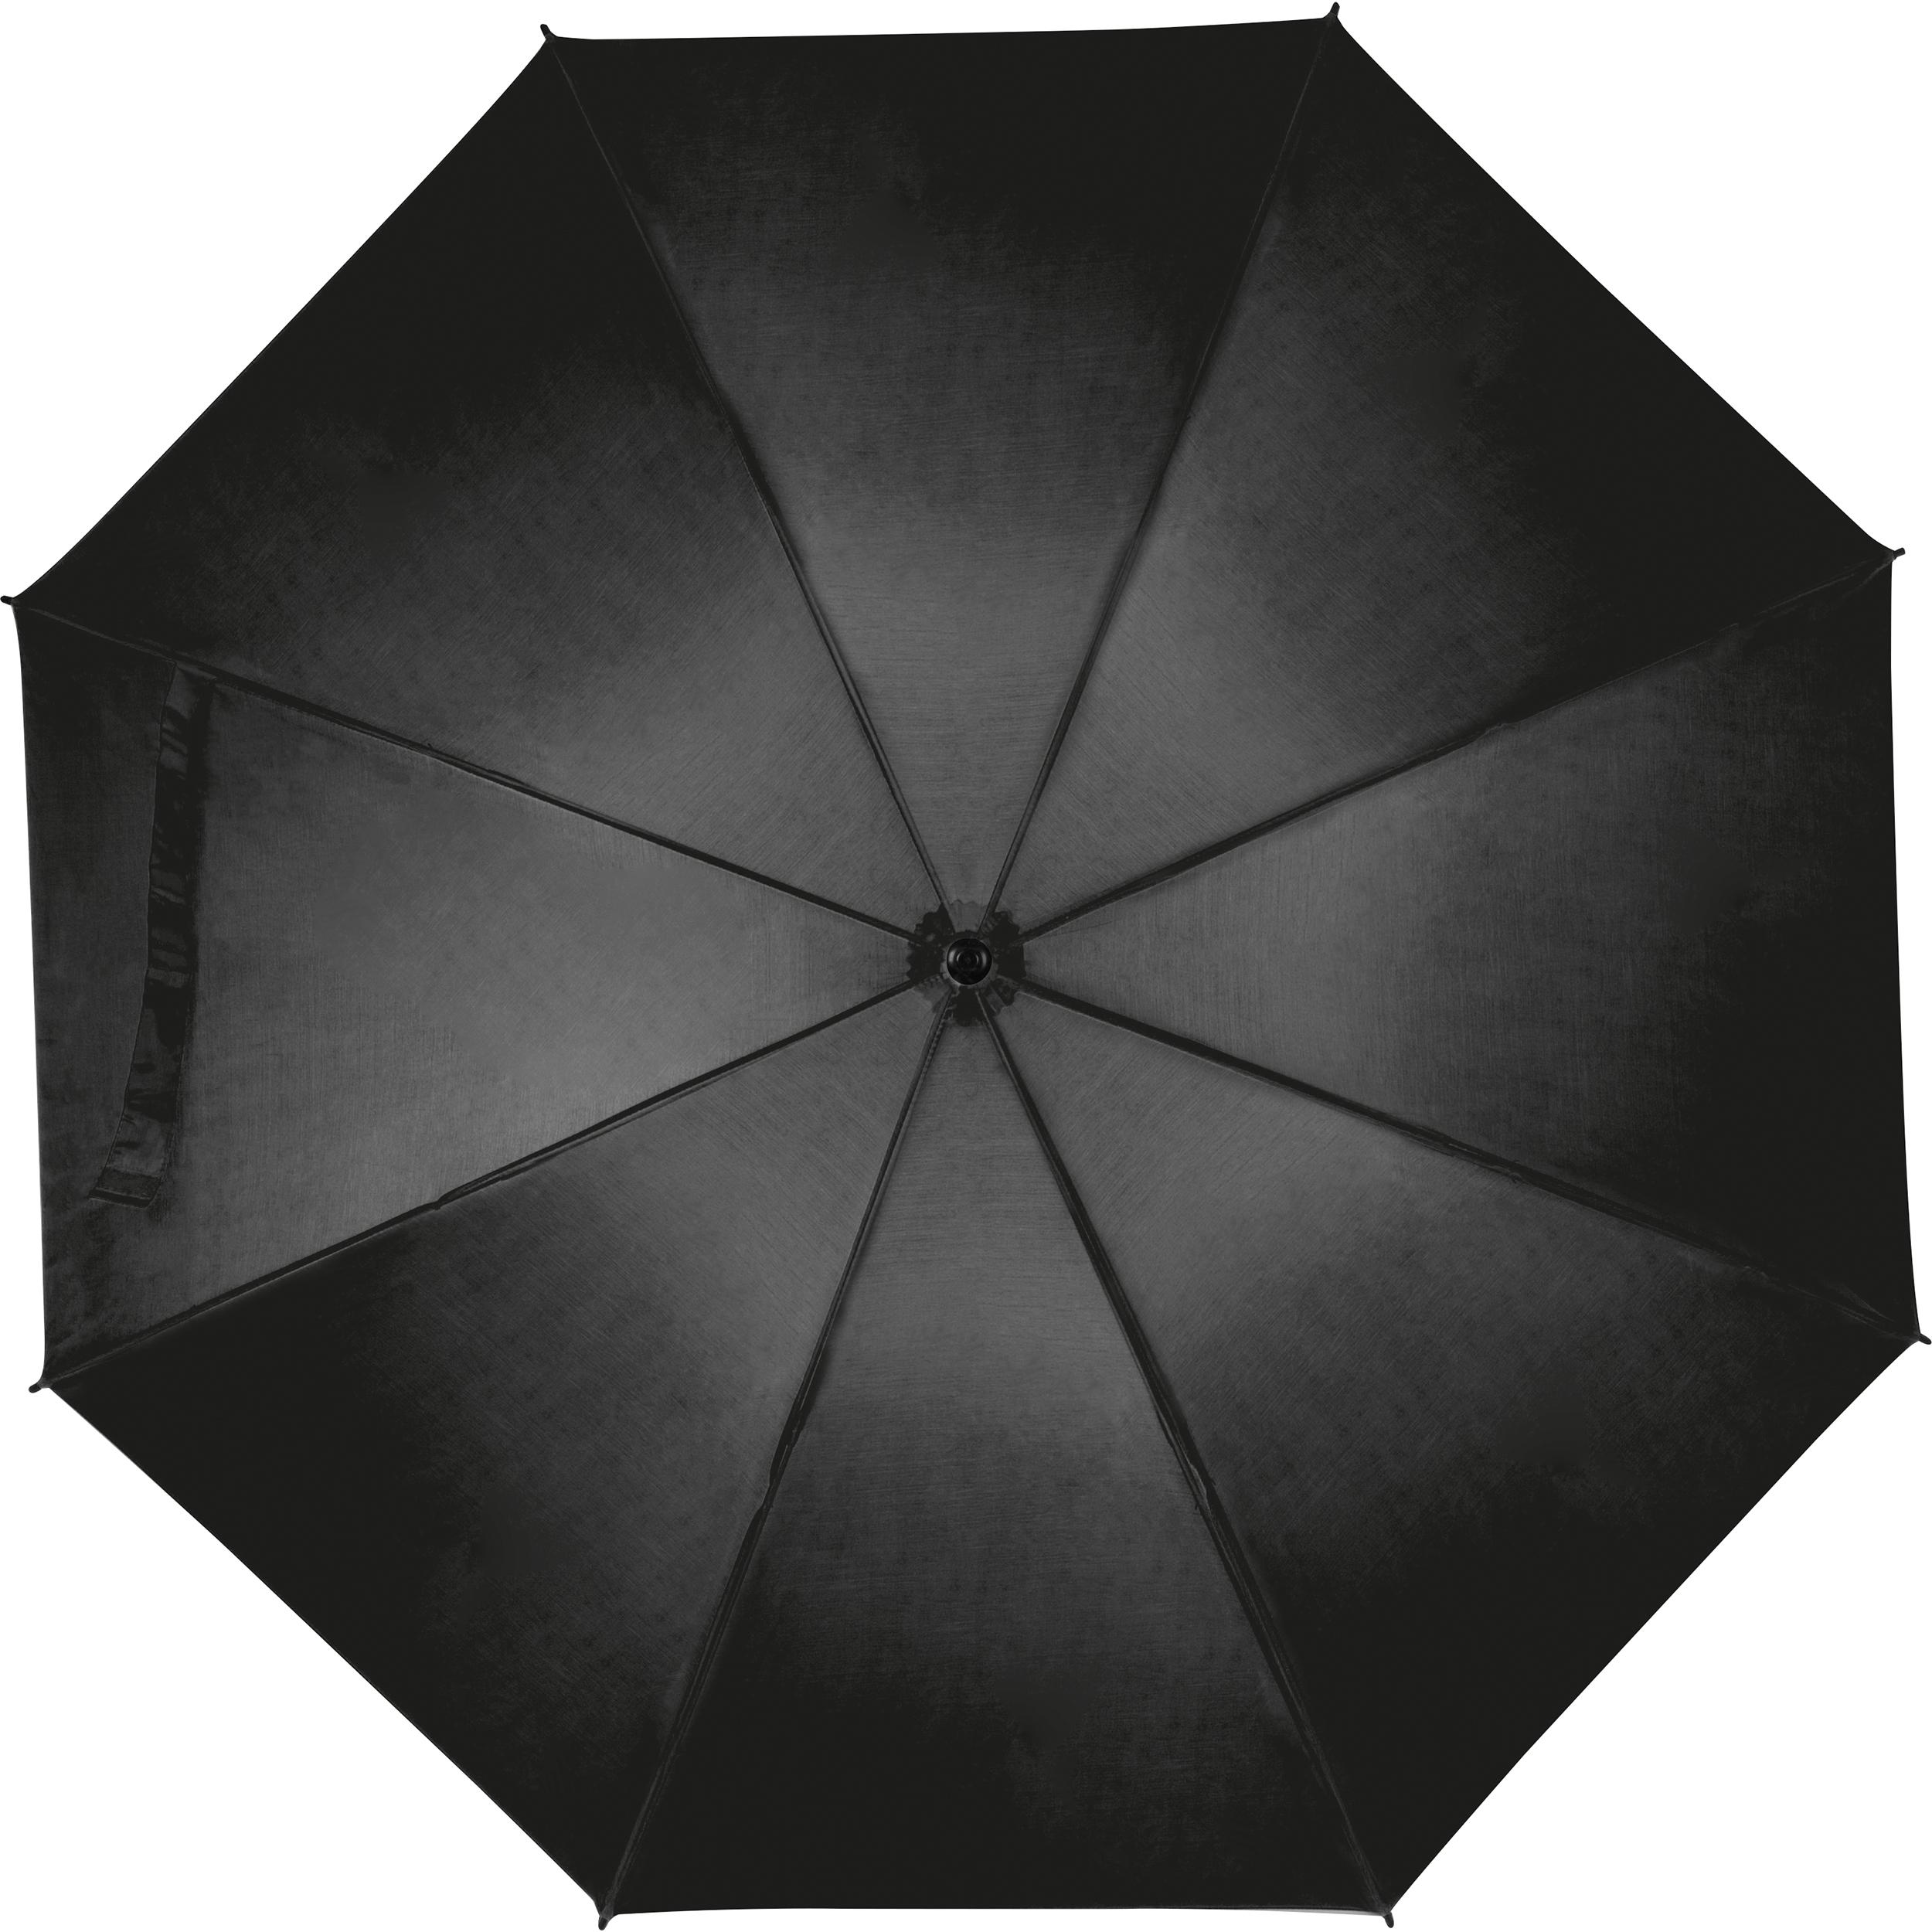 Large umbrella with soft grip.